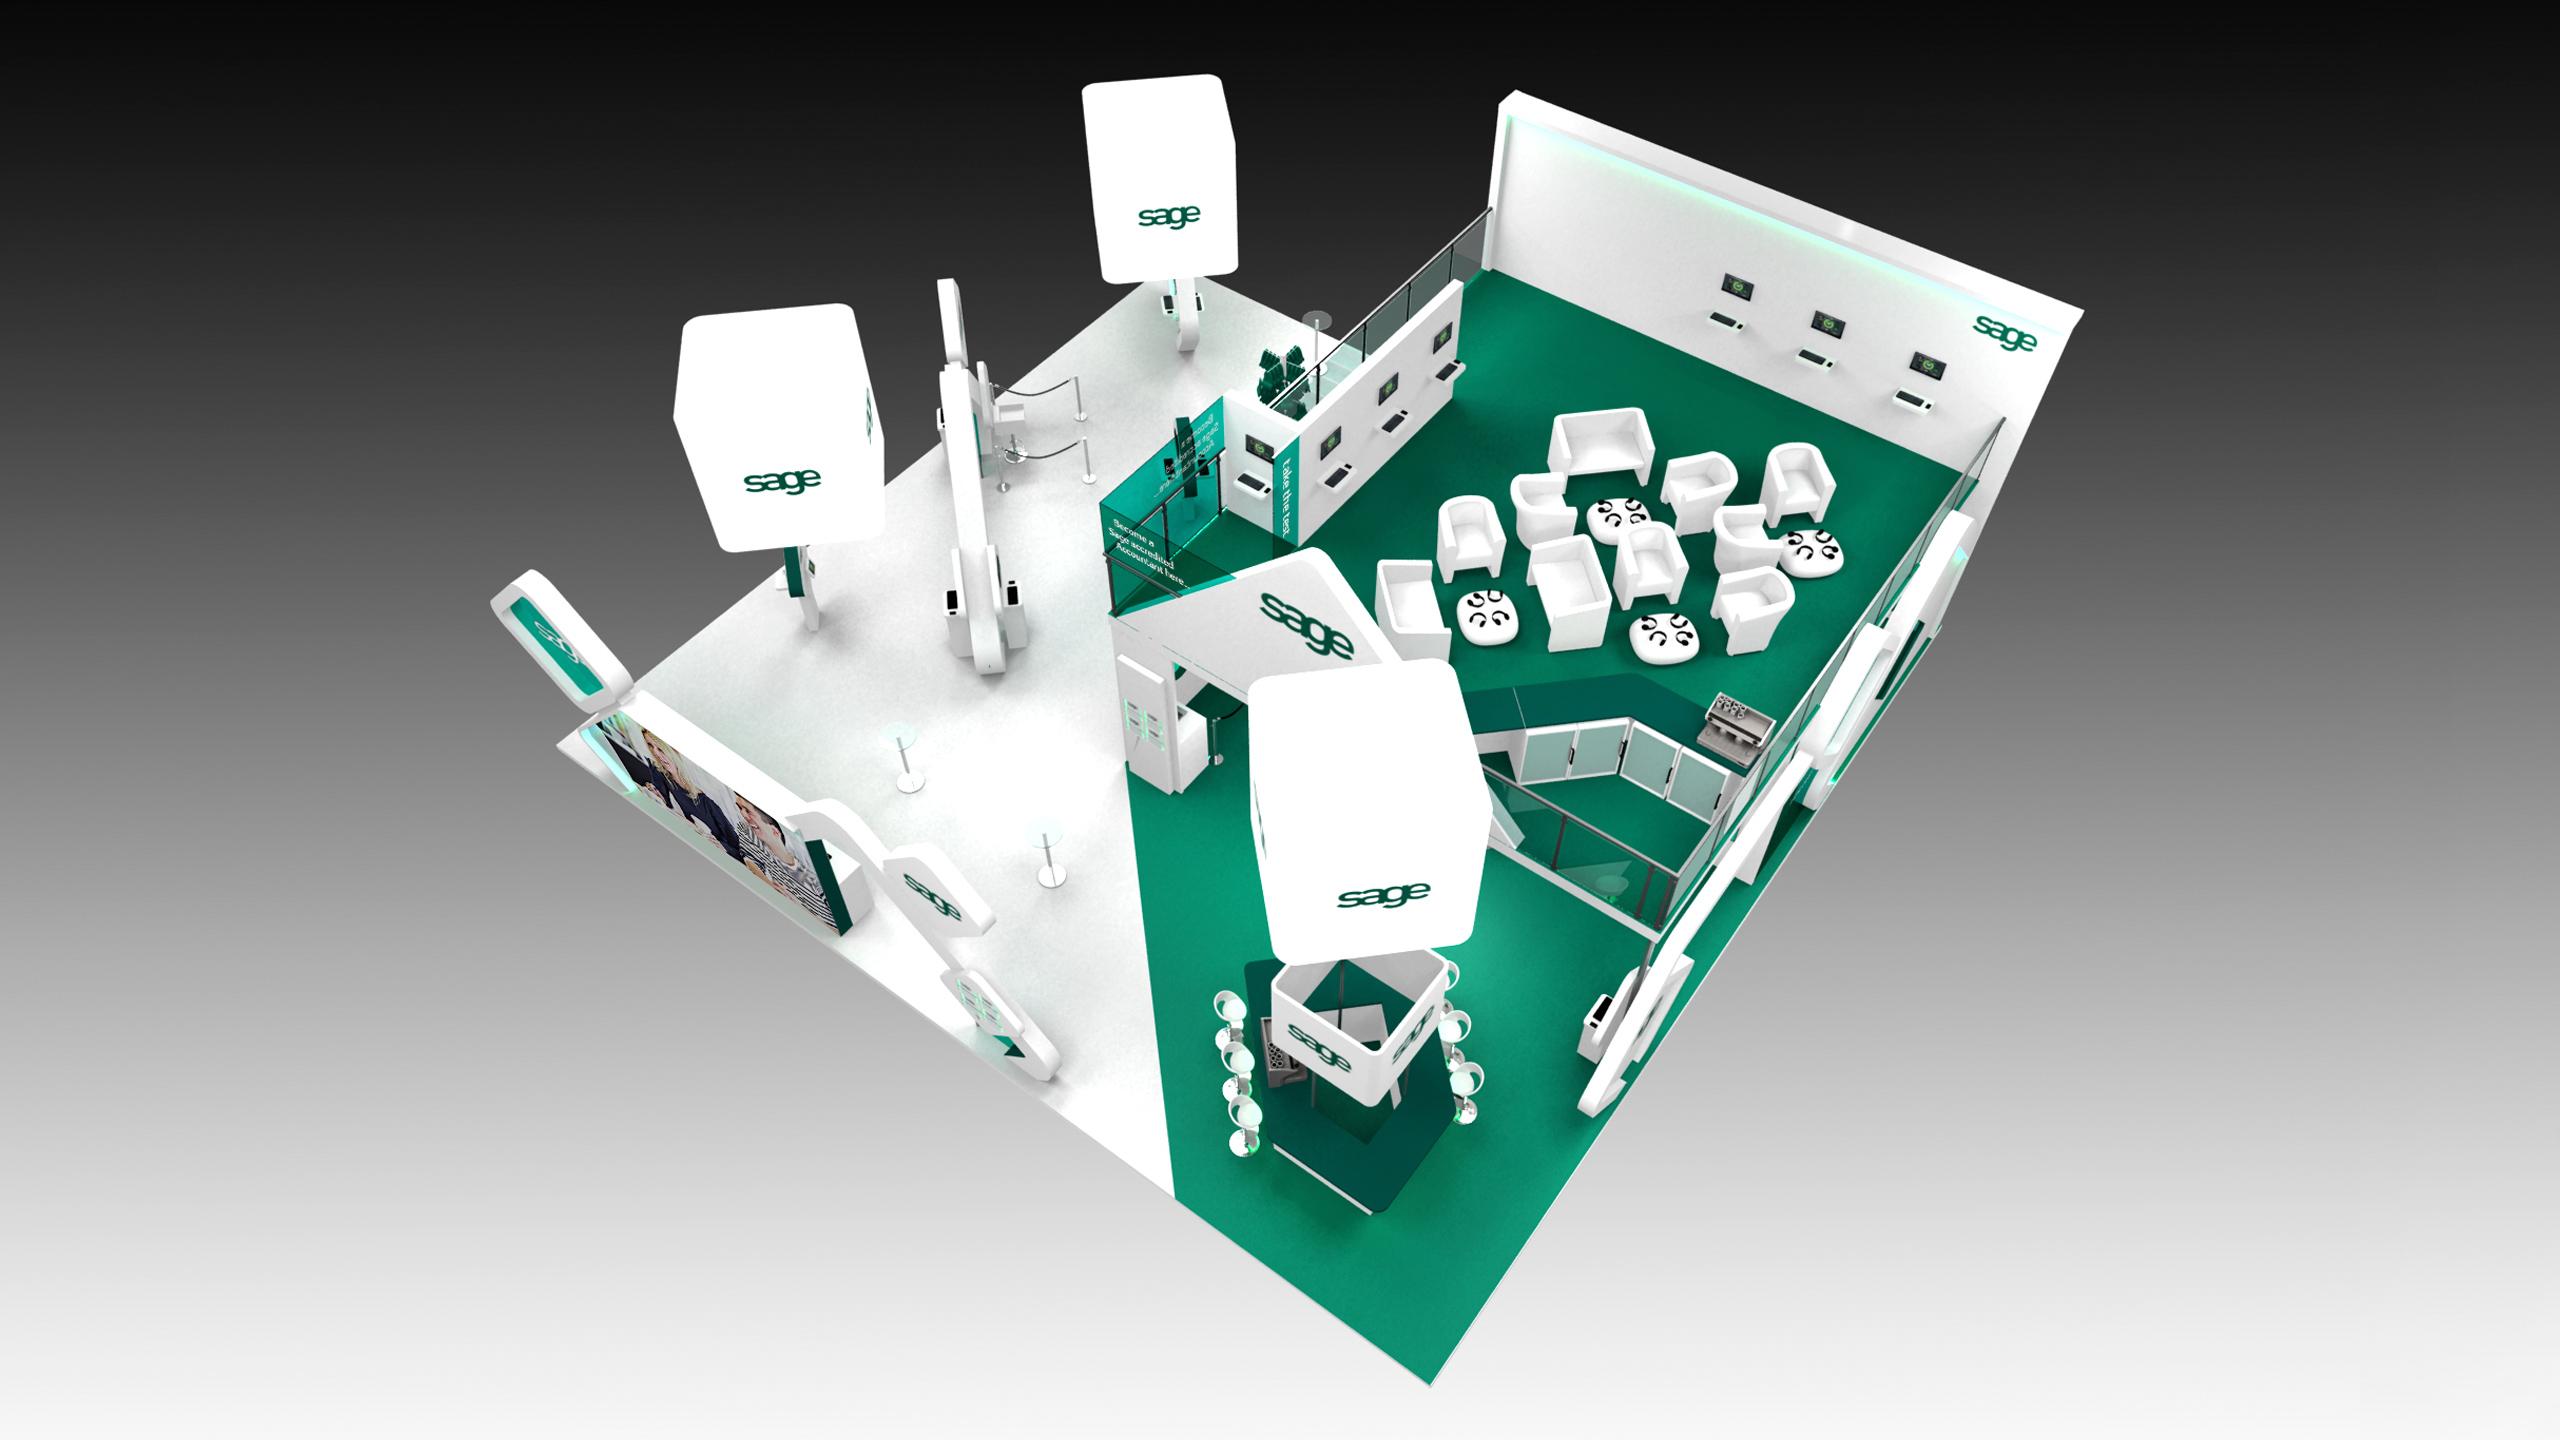 Exhibition Stand Design Cheshire : Double decker exhibition stand london cheshire cambridge